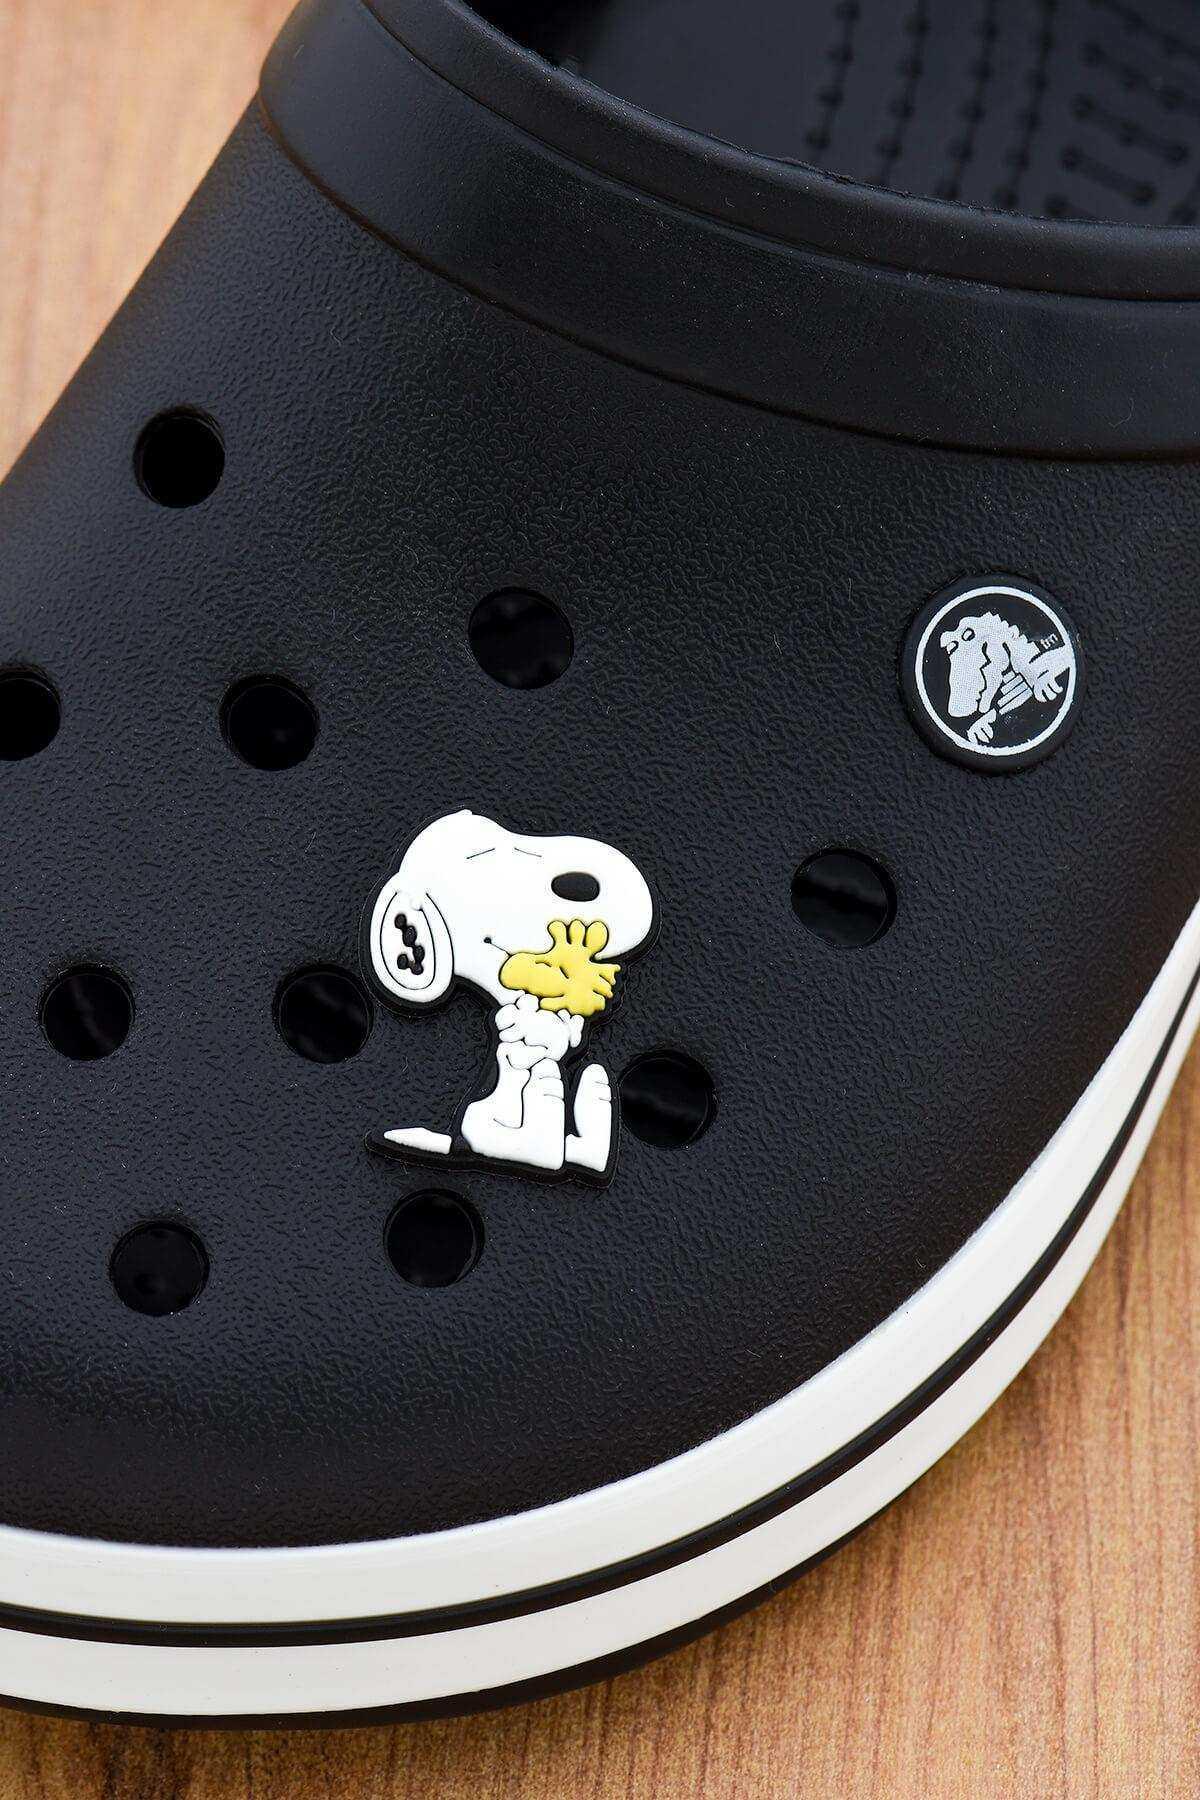 Snopy Jibbitz Crocs Terlik Süsü Charm Terlik Aksesuarı - CRS0010